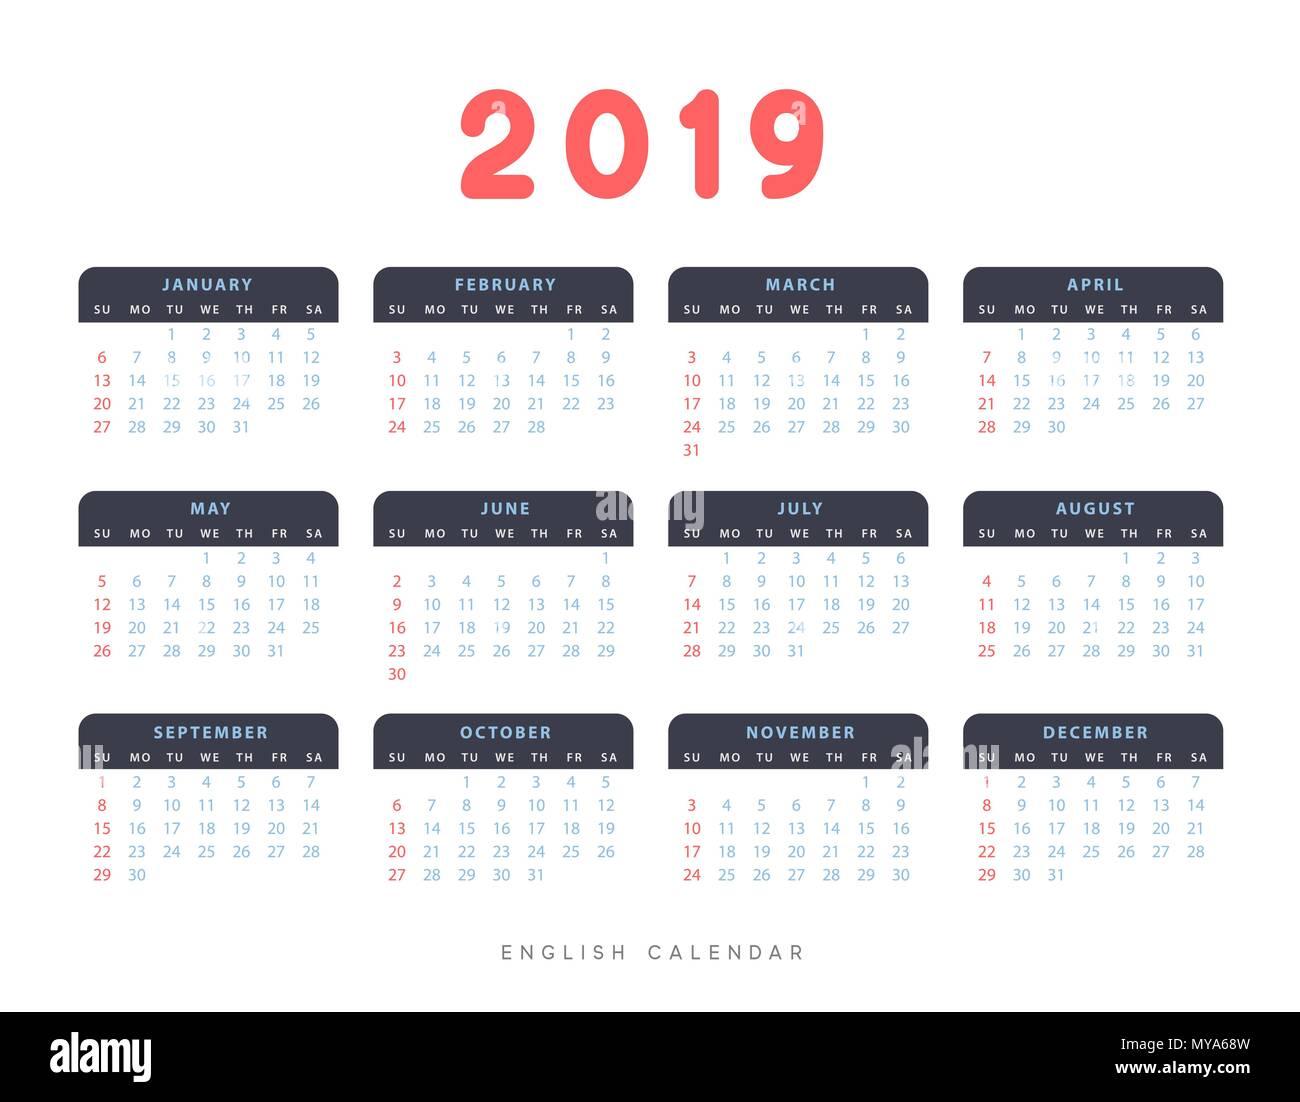 july 2019 calendar stock photos  u0026 july 2019 calendar stock